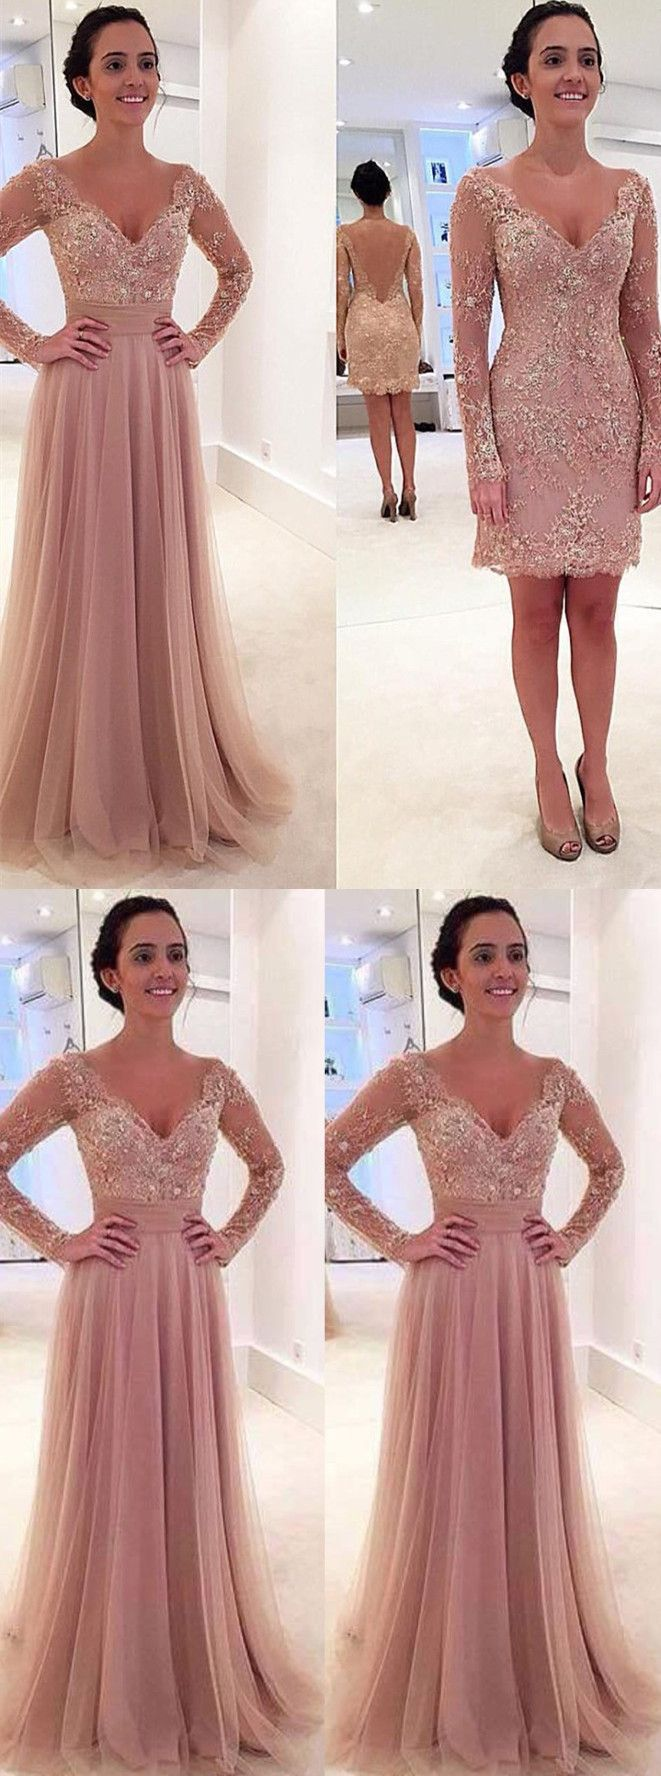 pink prom dresses,detachable  prom dresses,lace prom dresses,elegant prom dresses,2017 prom dresses @simpledress2480